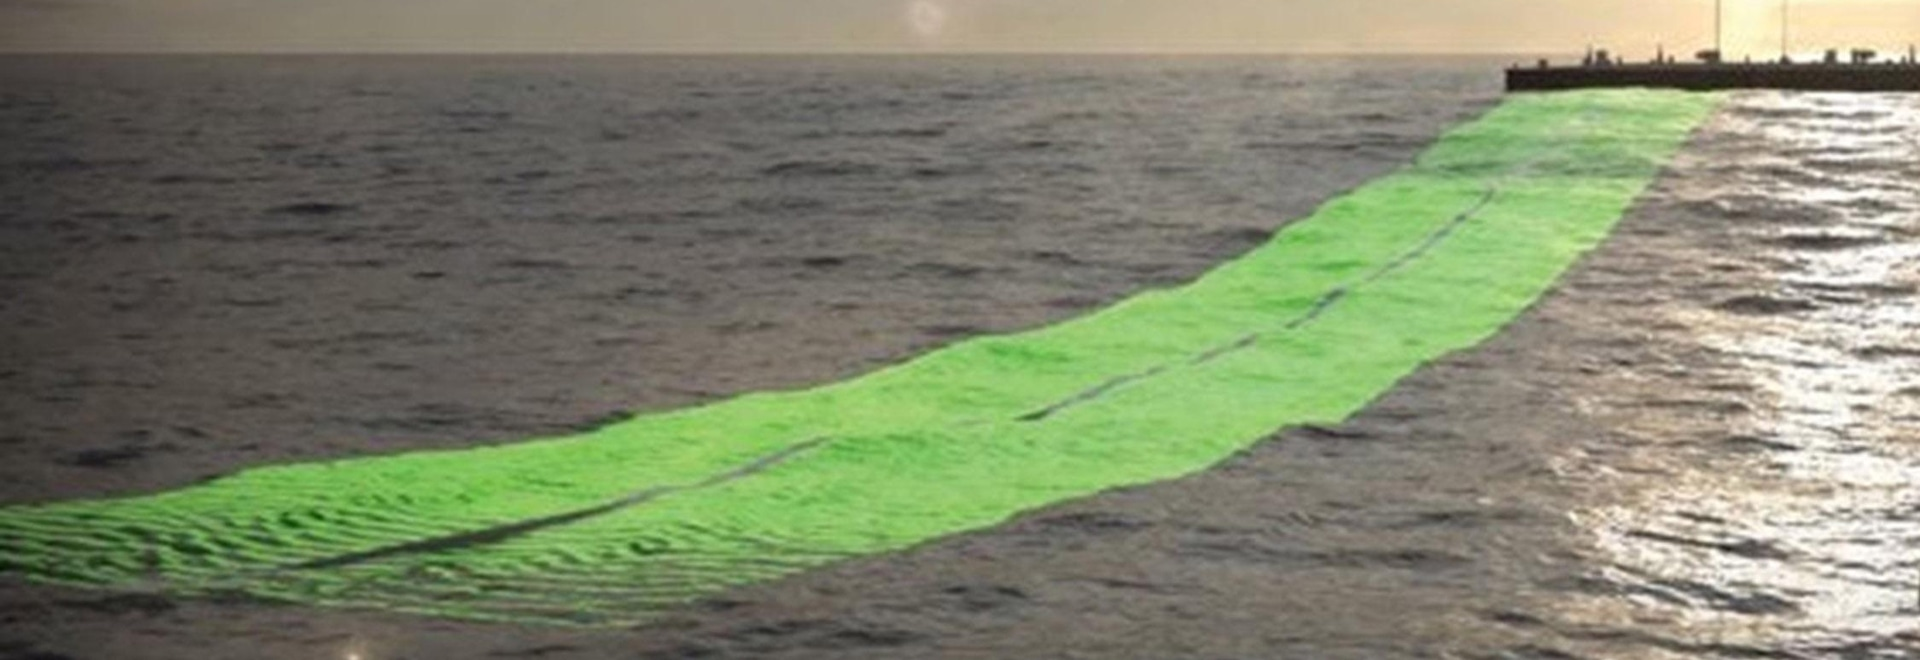 The Jospa Tug will need minimal power from a conventional tug to maintain its heading (Govt Europa - Jospa)